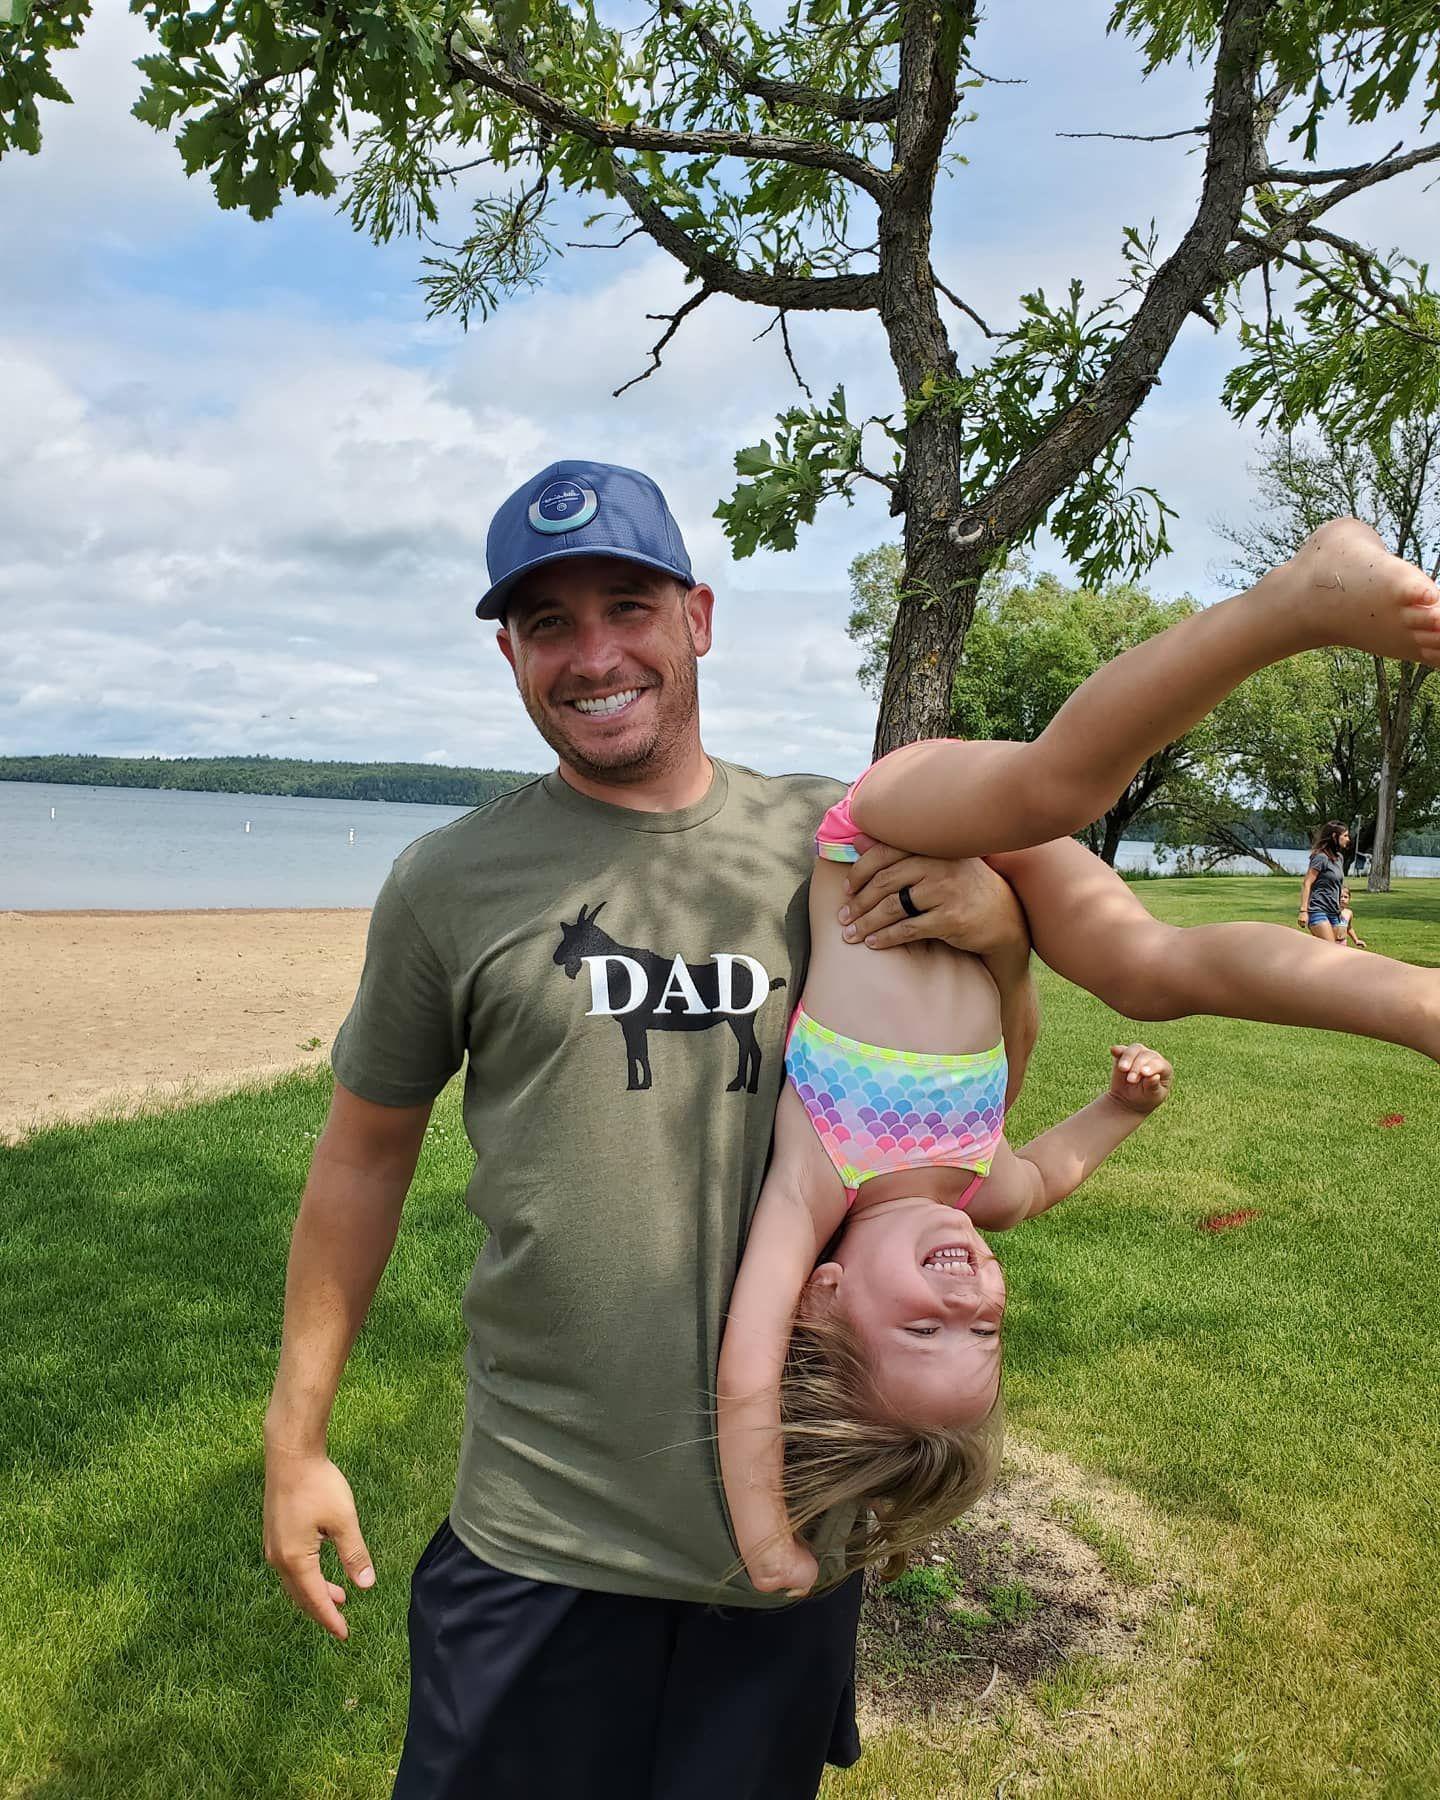 Grab your shirt at dadwilder.com! . . . . . #parentmemes #parenting #momtruth #dadhumor #moms #dadbod #girldad #parentinglife #dadlife #momlife #parentinghumor #dadsofinstagram #momsofinstagram #dads #dadshirt #parentingmemes #dadbodszn #fathersday #funnydad #raisingkids #lifewithkids #lifeofdad #toddlers #dadstuff #dadjokes #dadmemes #goat #parentsofinstagram #kidsaretheworst #dad